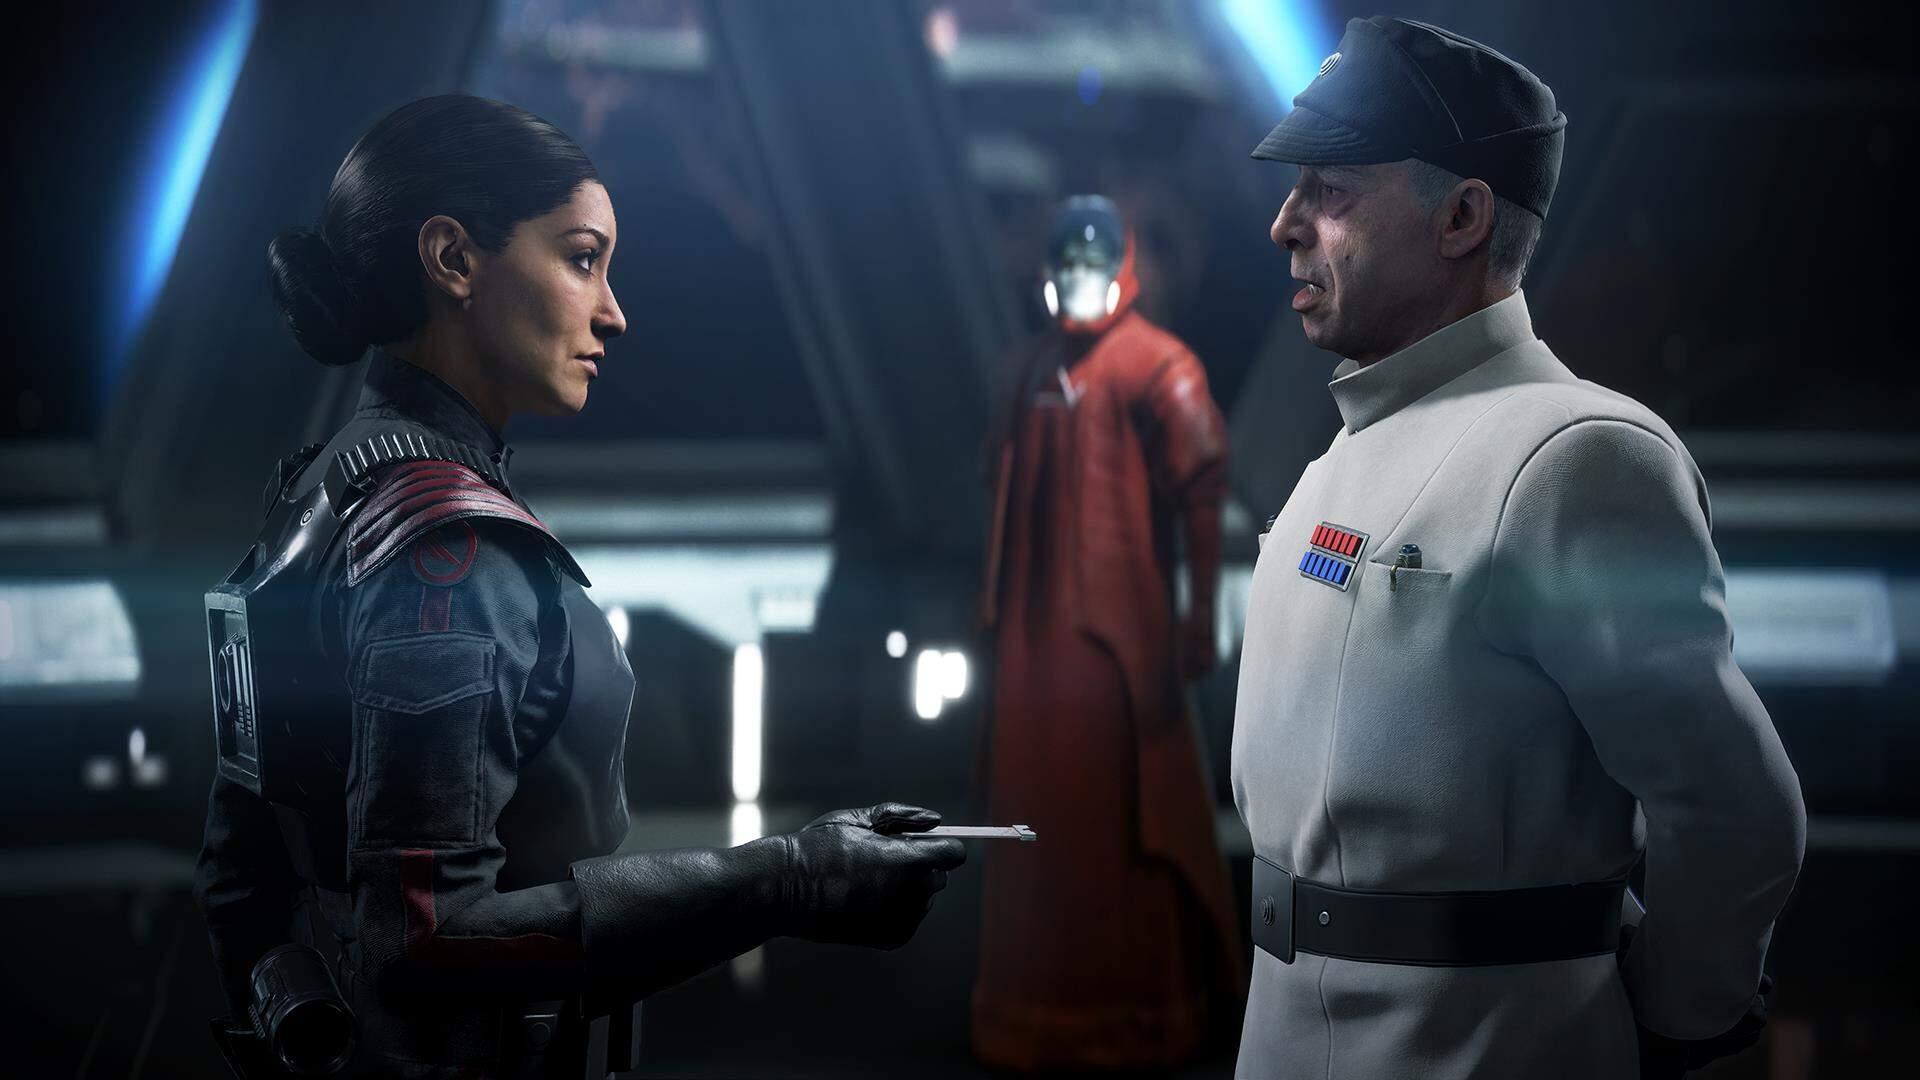 Star Wars Battlefront 2 Screenshot 01